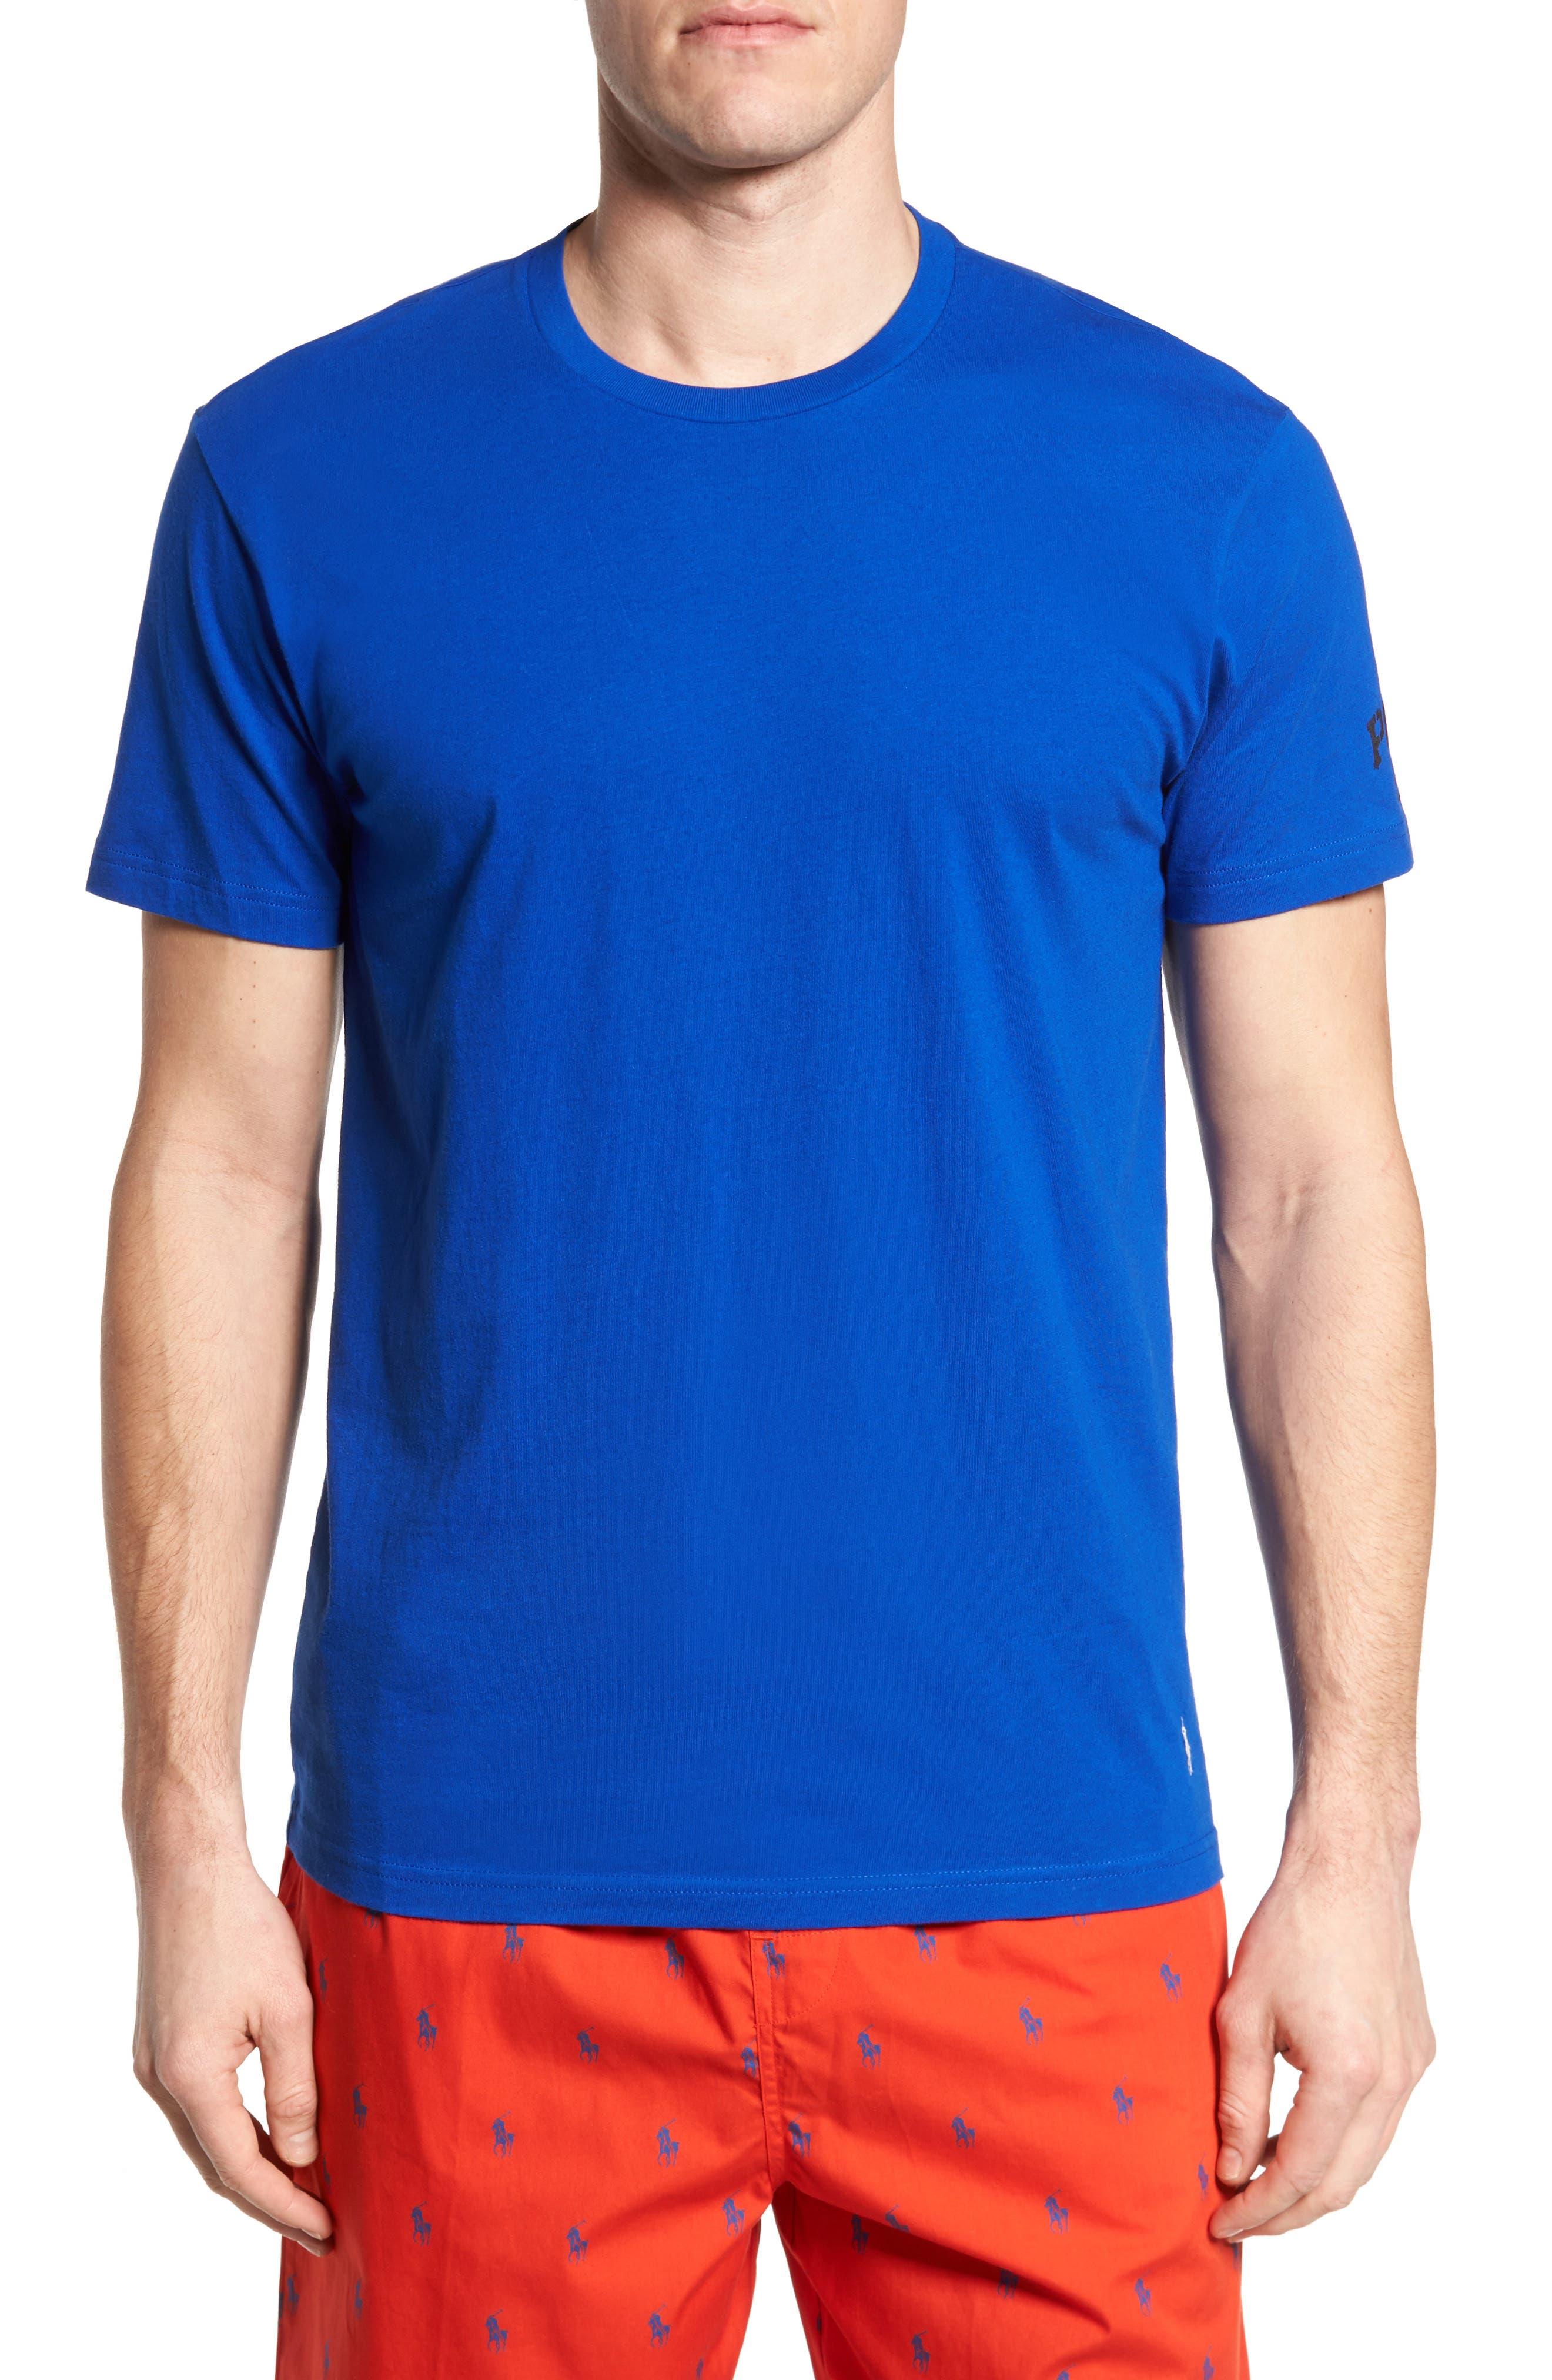 Alternate Image 1 Selected - Polo Ralph Lauren Crewneck T-Shirt